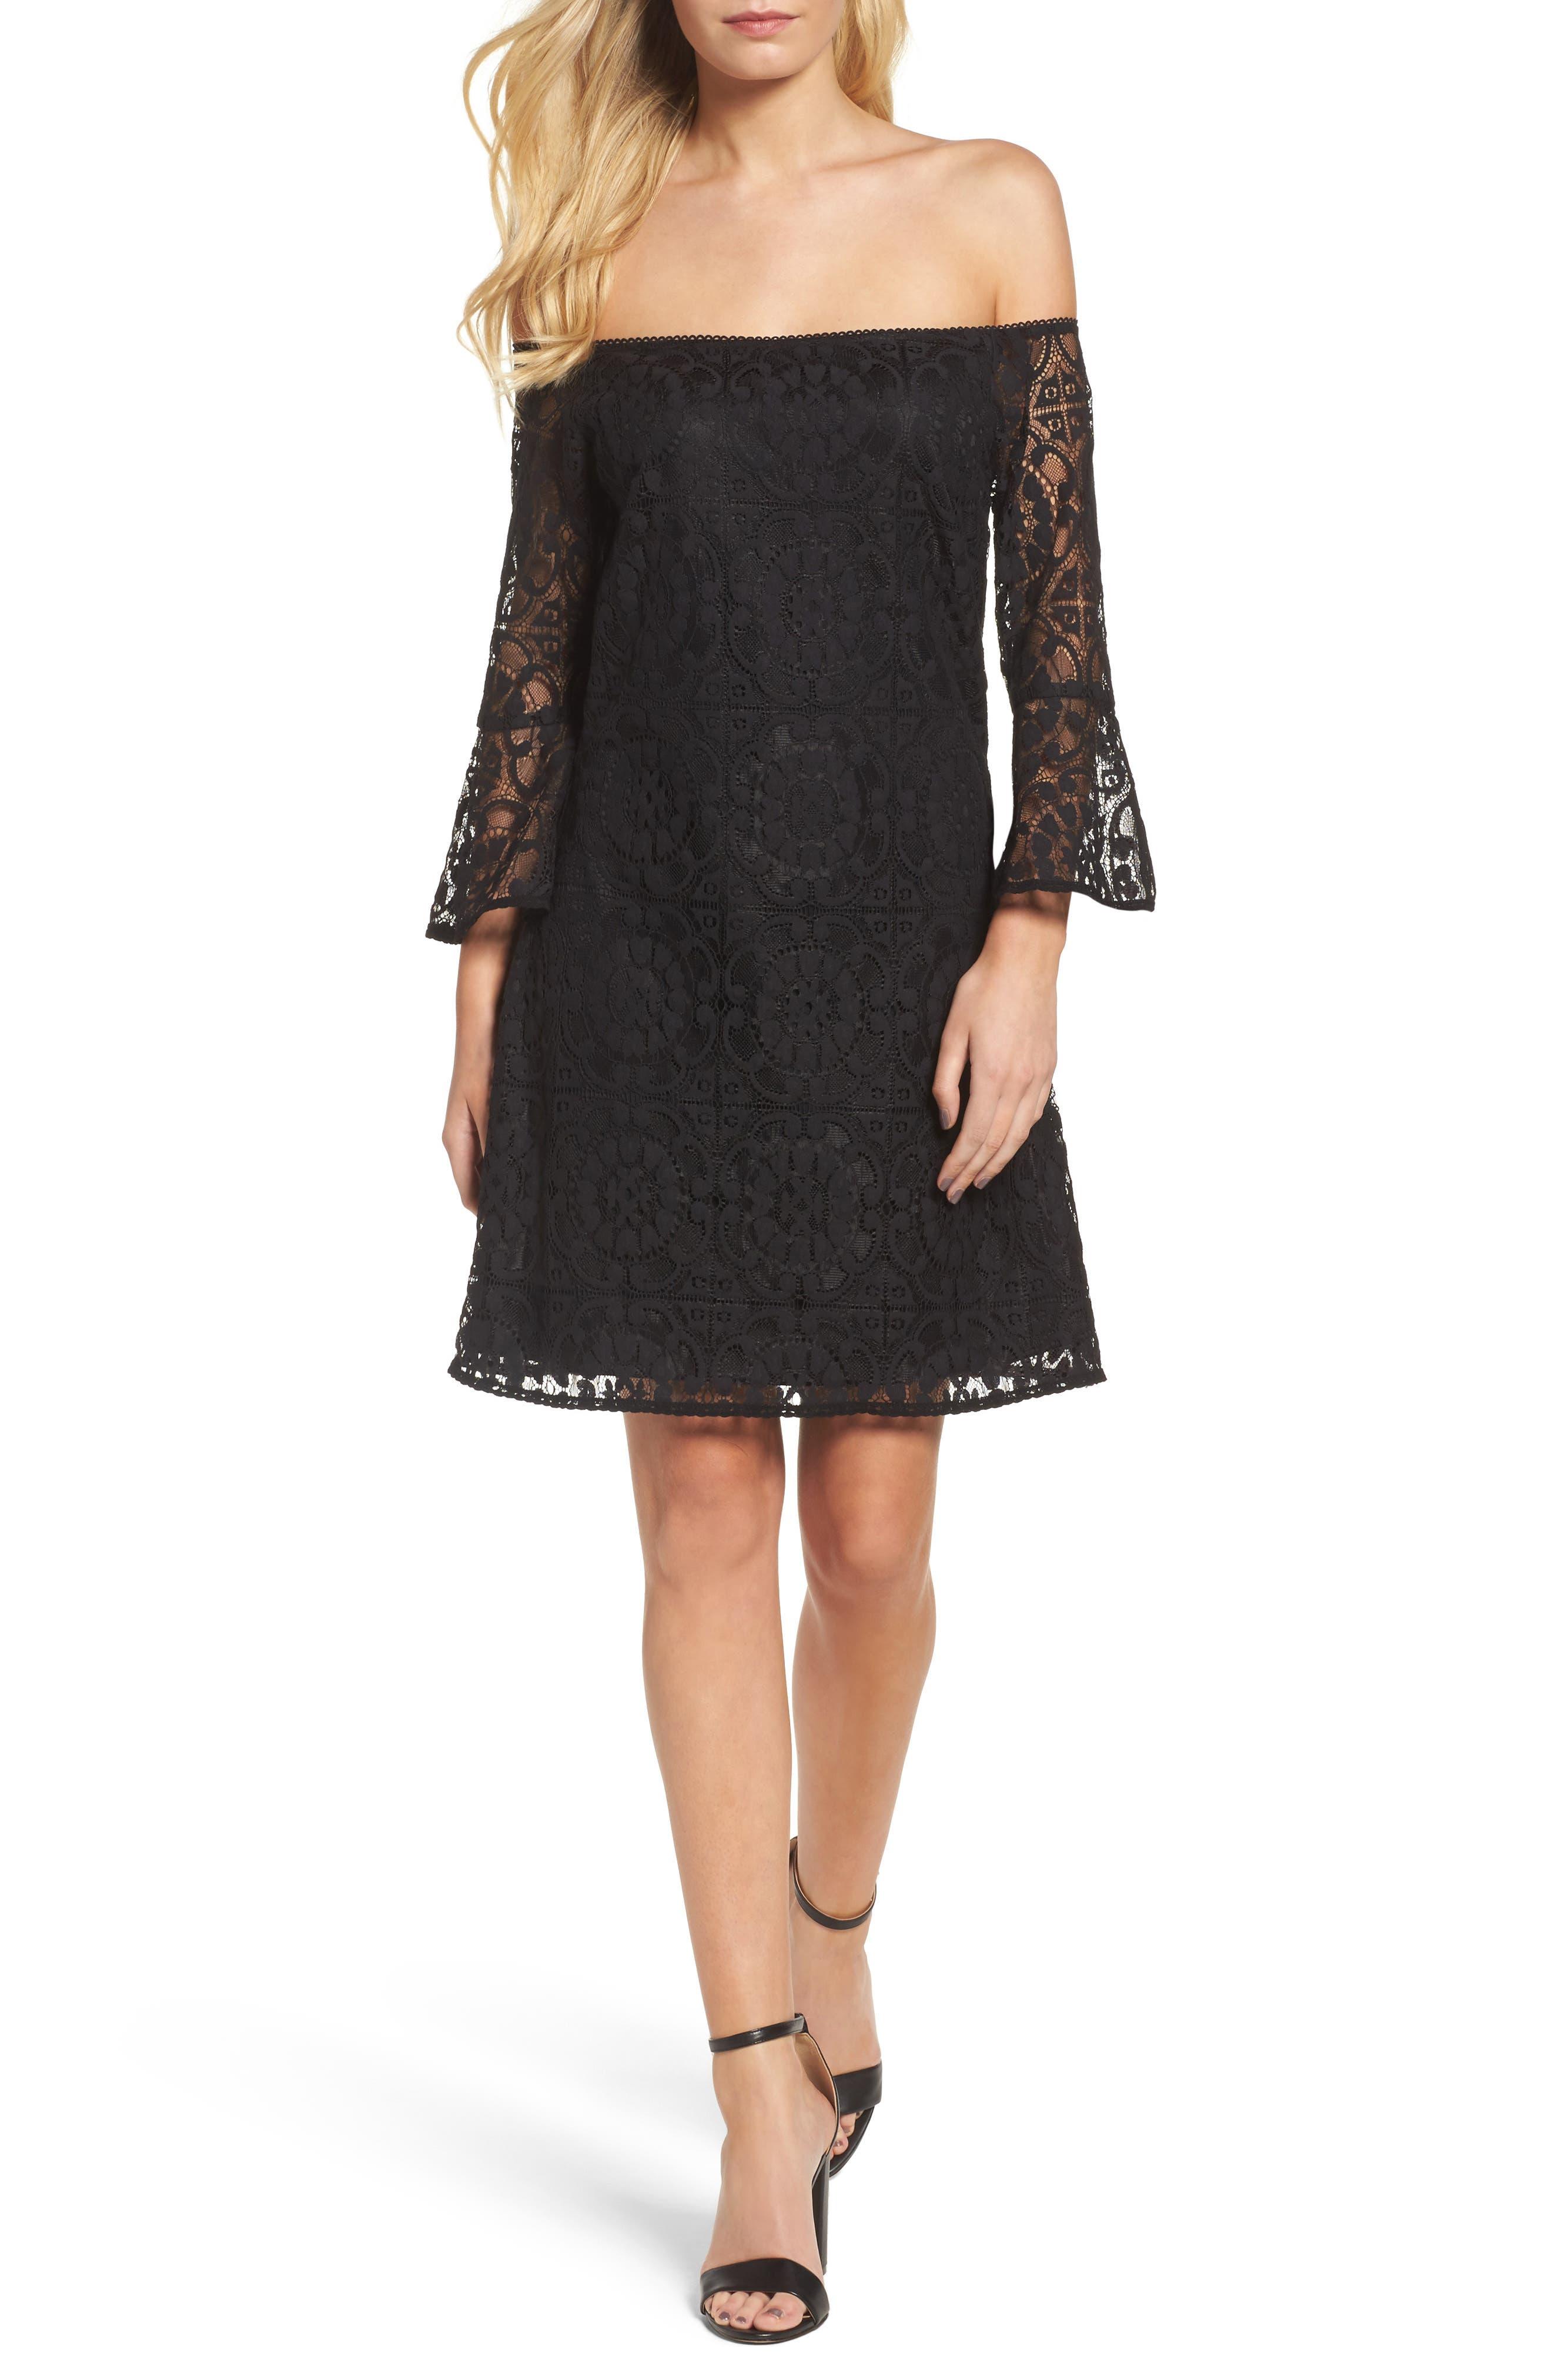 NSR Lace A-Line Dress